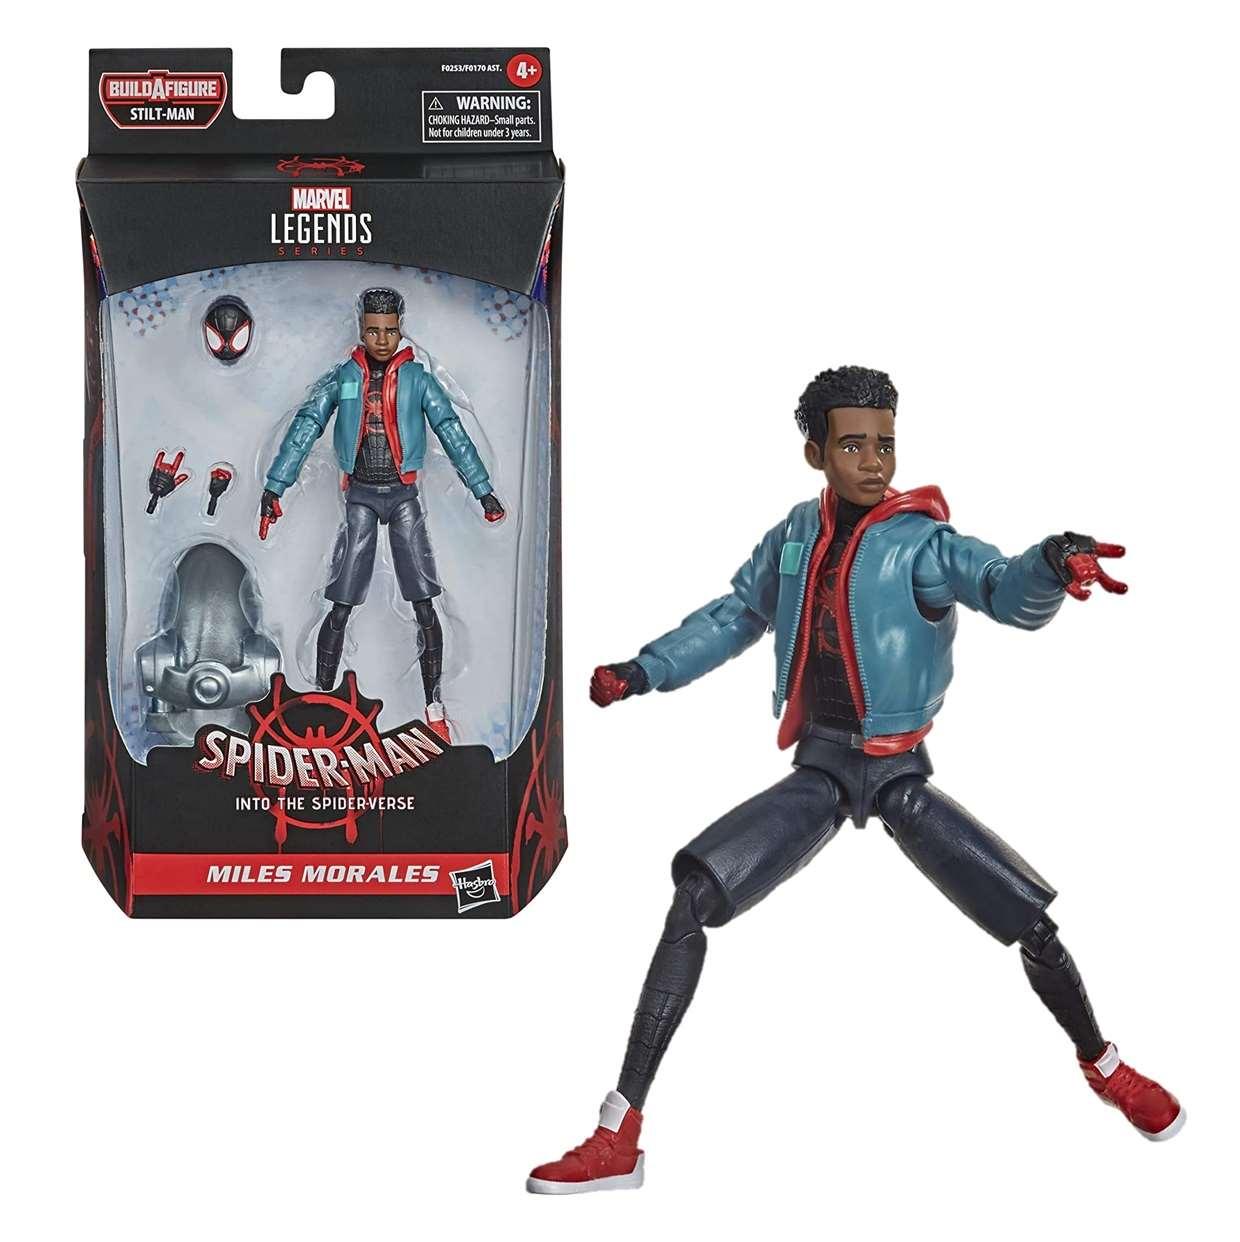 Miles Morales Figura Spider Man Into The Spiderverse 6 PuLG